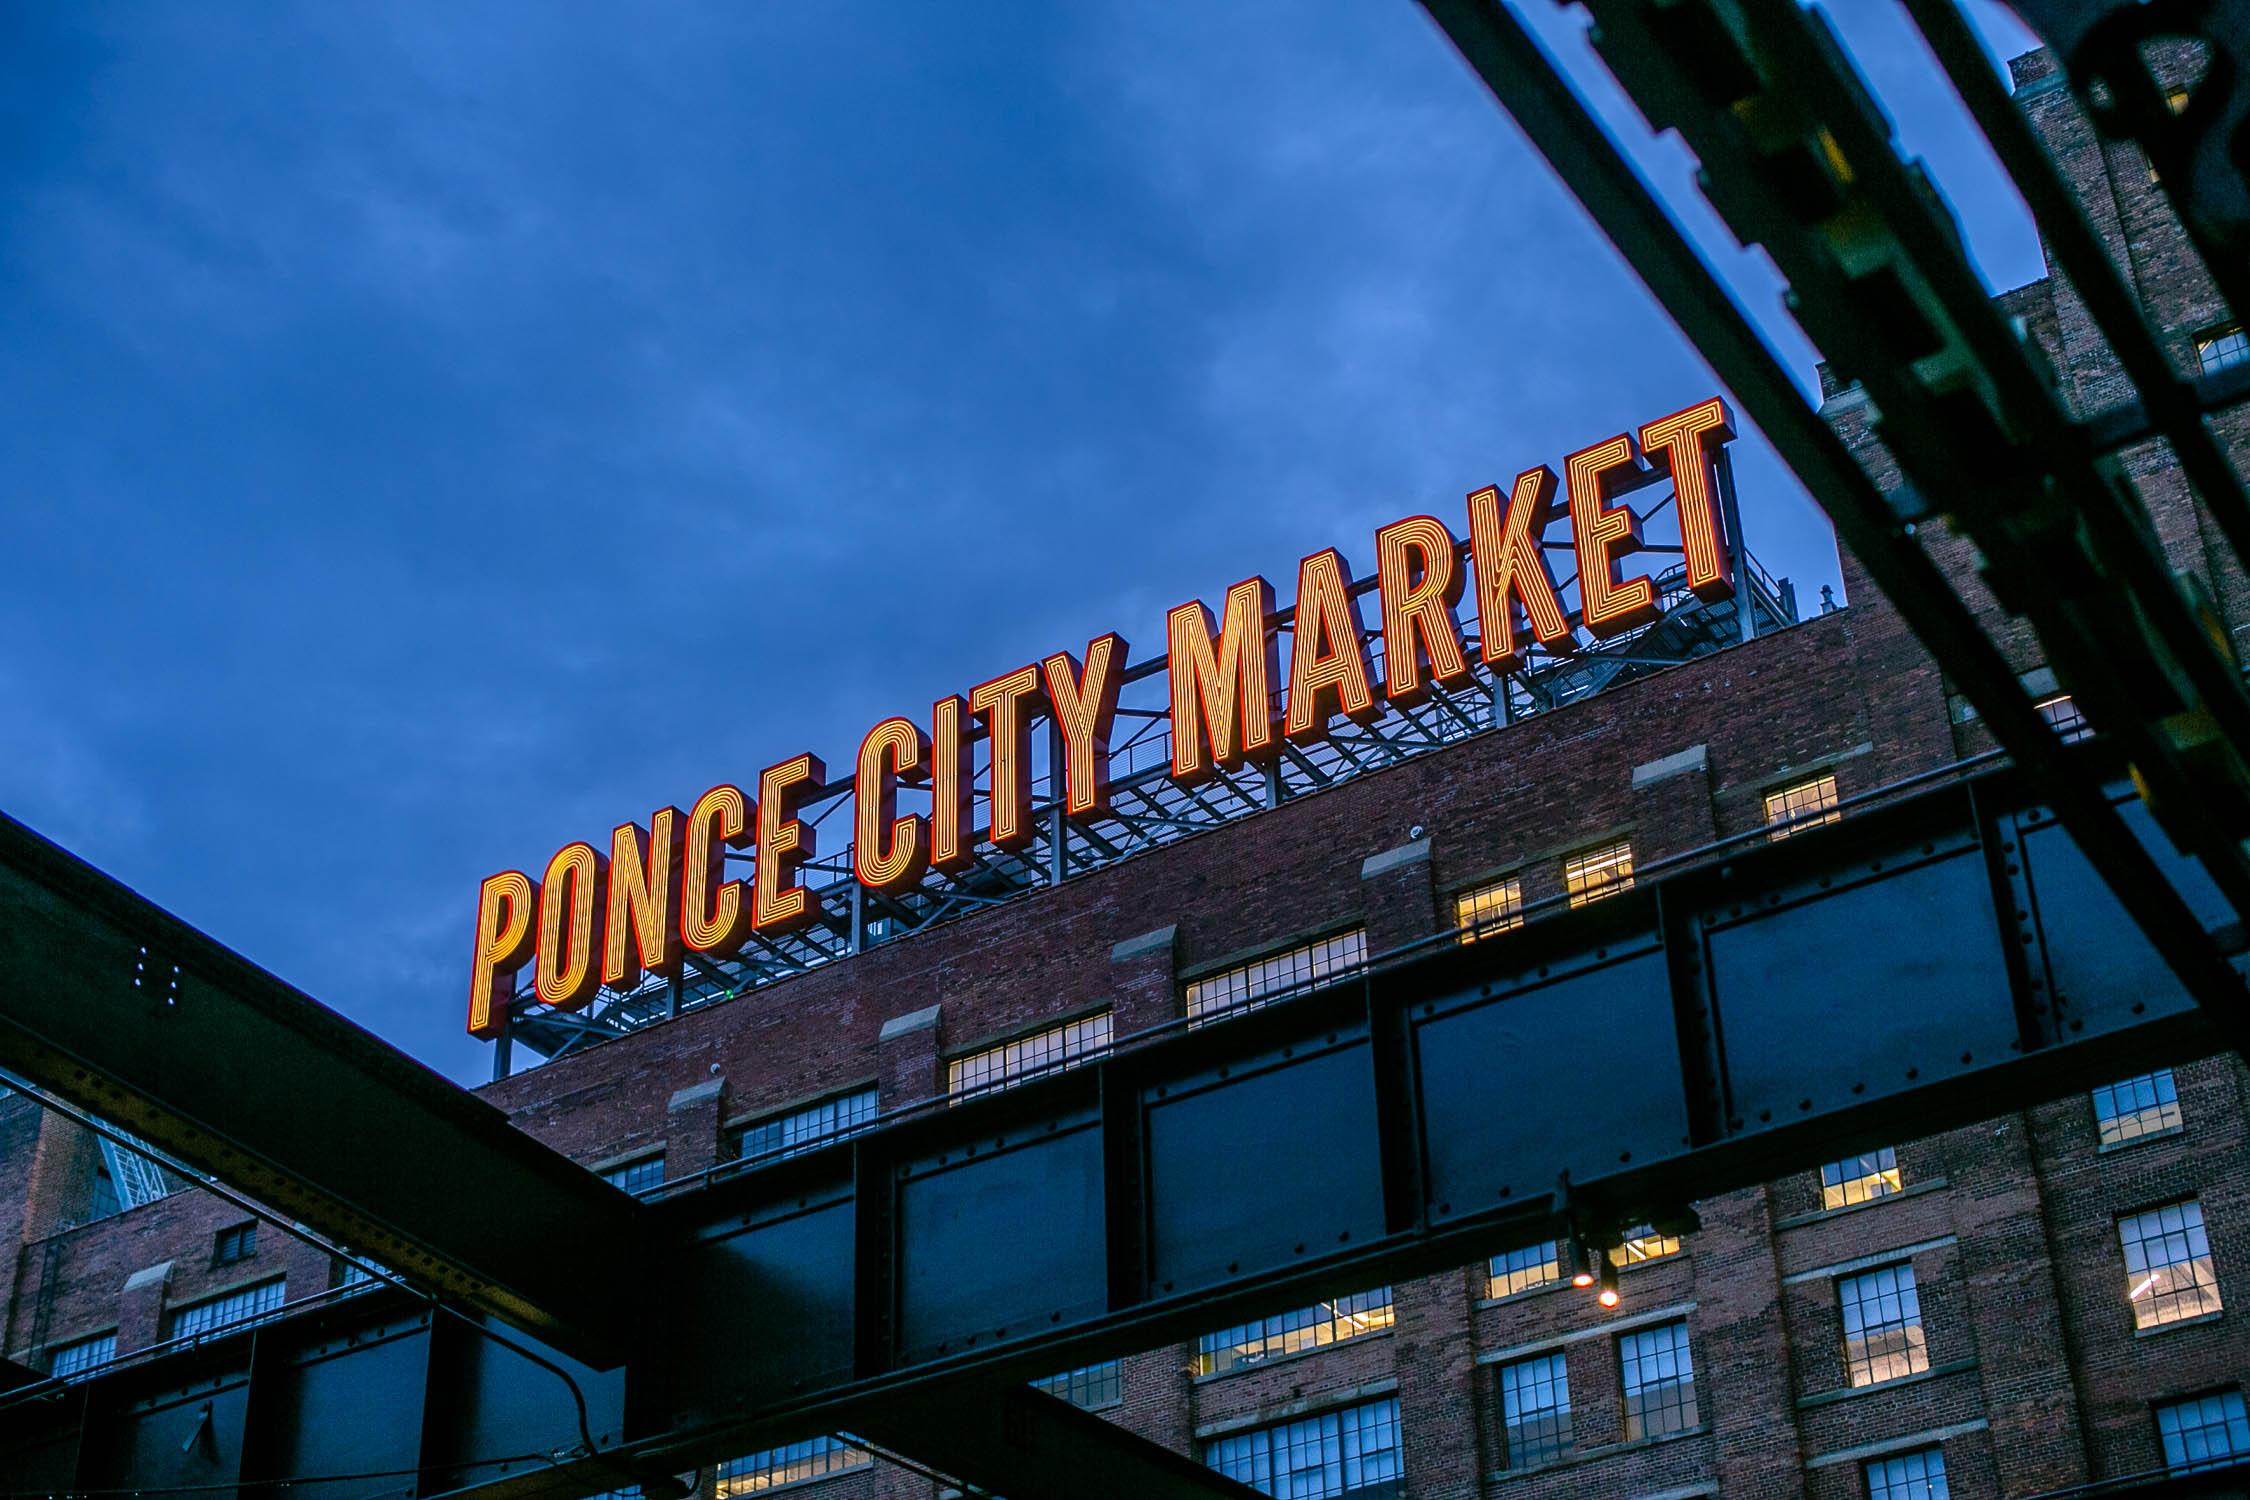 Ponce-City-Market-Sign-Atlanta-Erik-Meadows